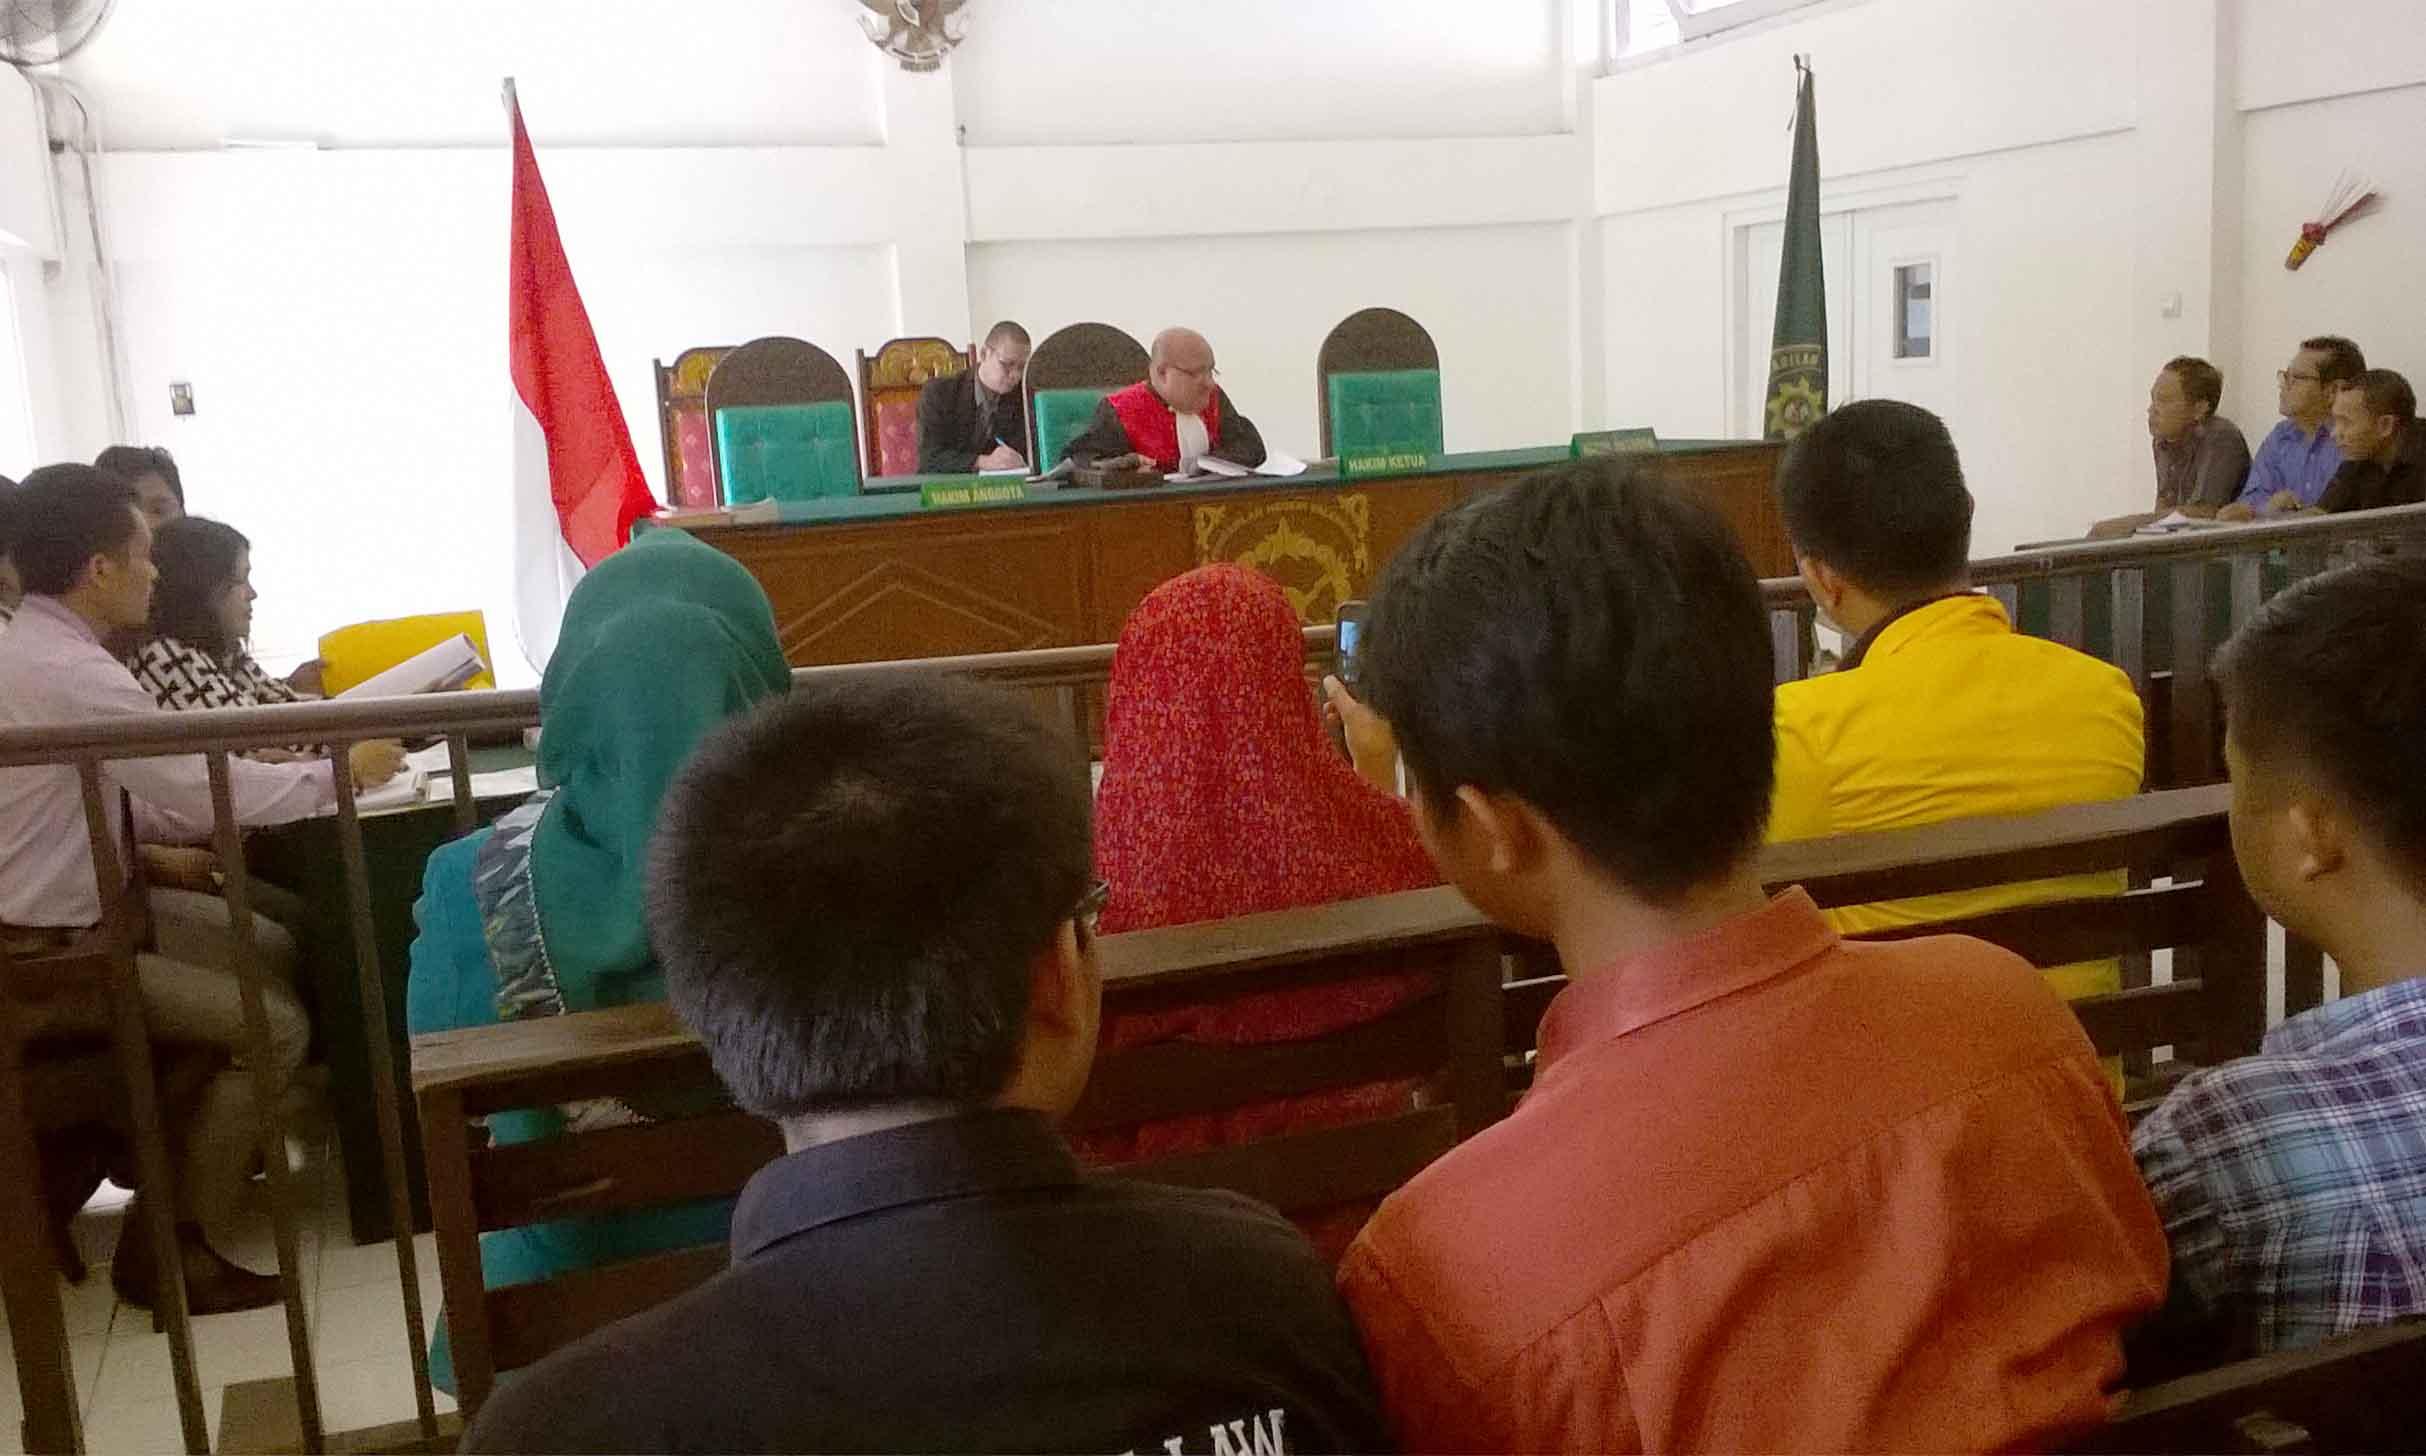 Foto : Ellyvon Pra Peradilan hari kedua atas kasus uang hibah dan tuduhan penggelapan uang Rp 80 Juta Rupiah oleh Sri Farida binti Suhaimi. Pengadilan Negeri Palembang, Selasa (8/3/2016).